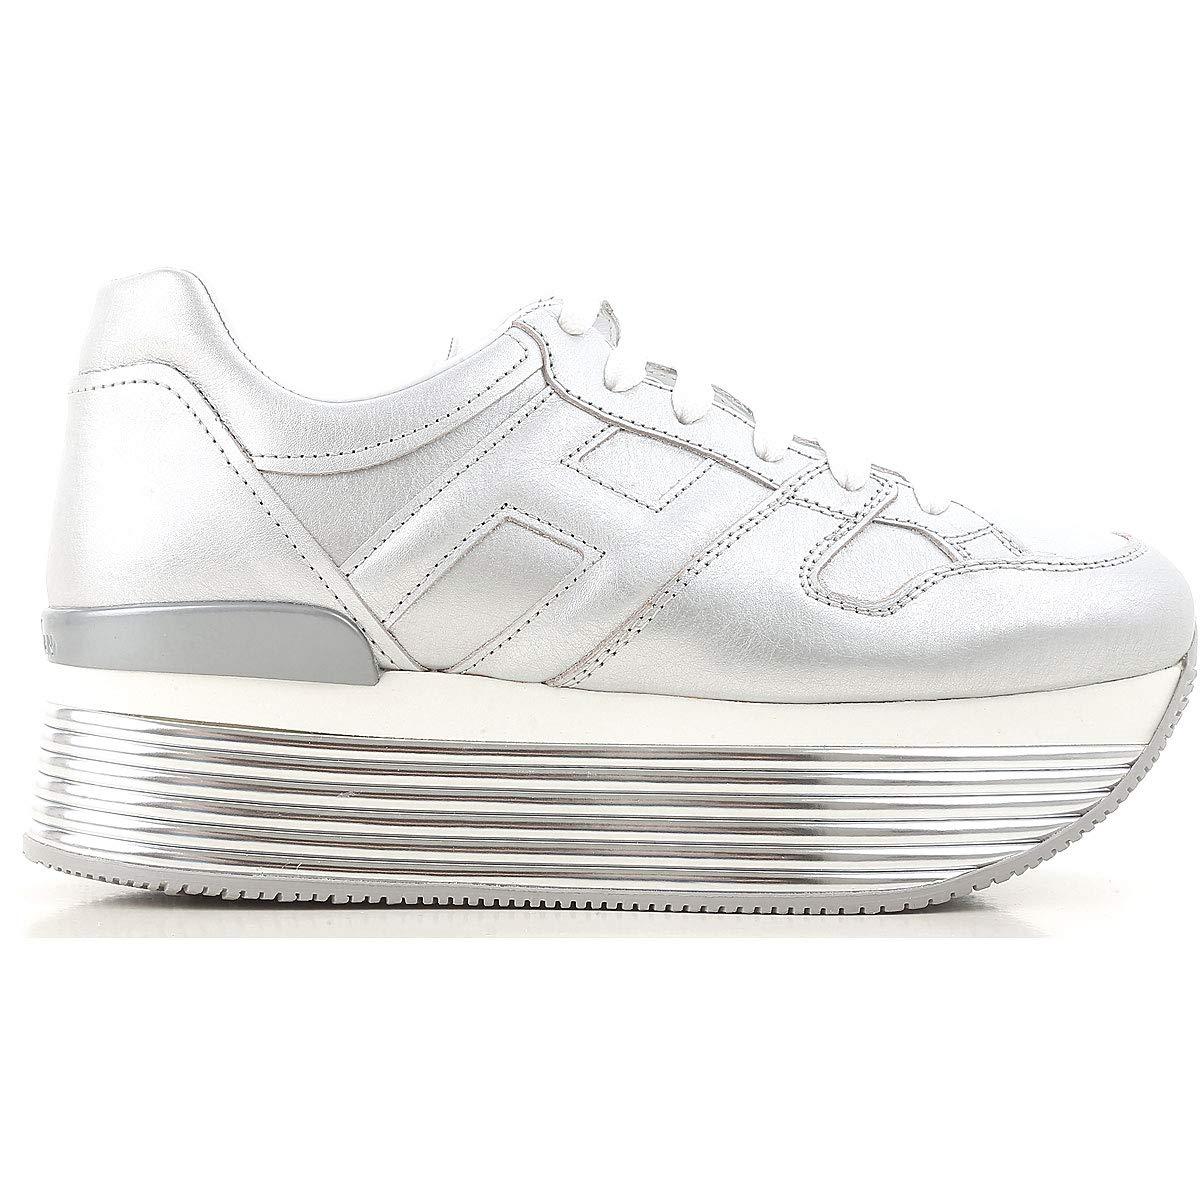 Hogan Maxi H222 Sneakers HXW3520T548I6EB200 Argento Donna -